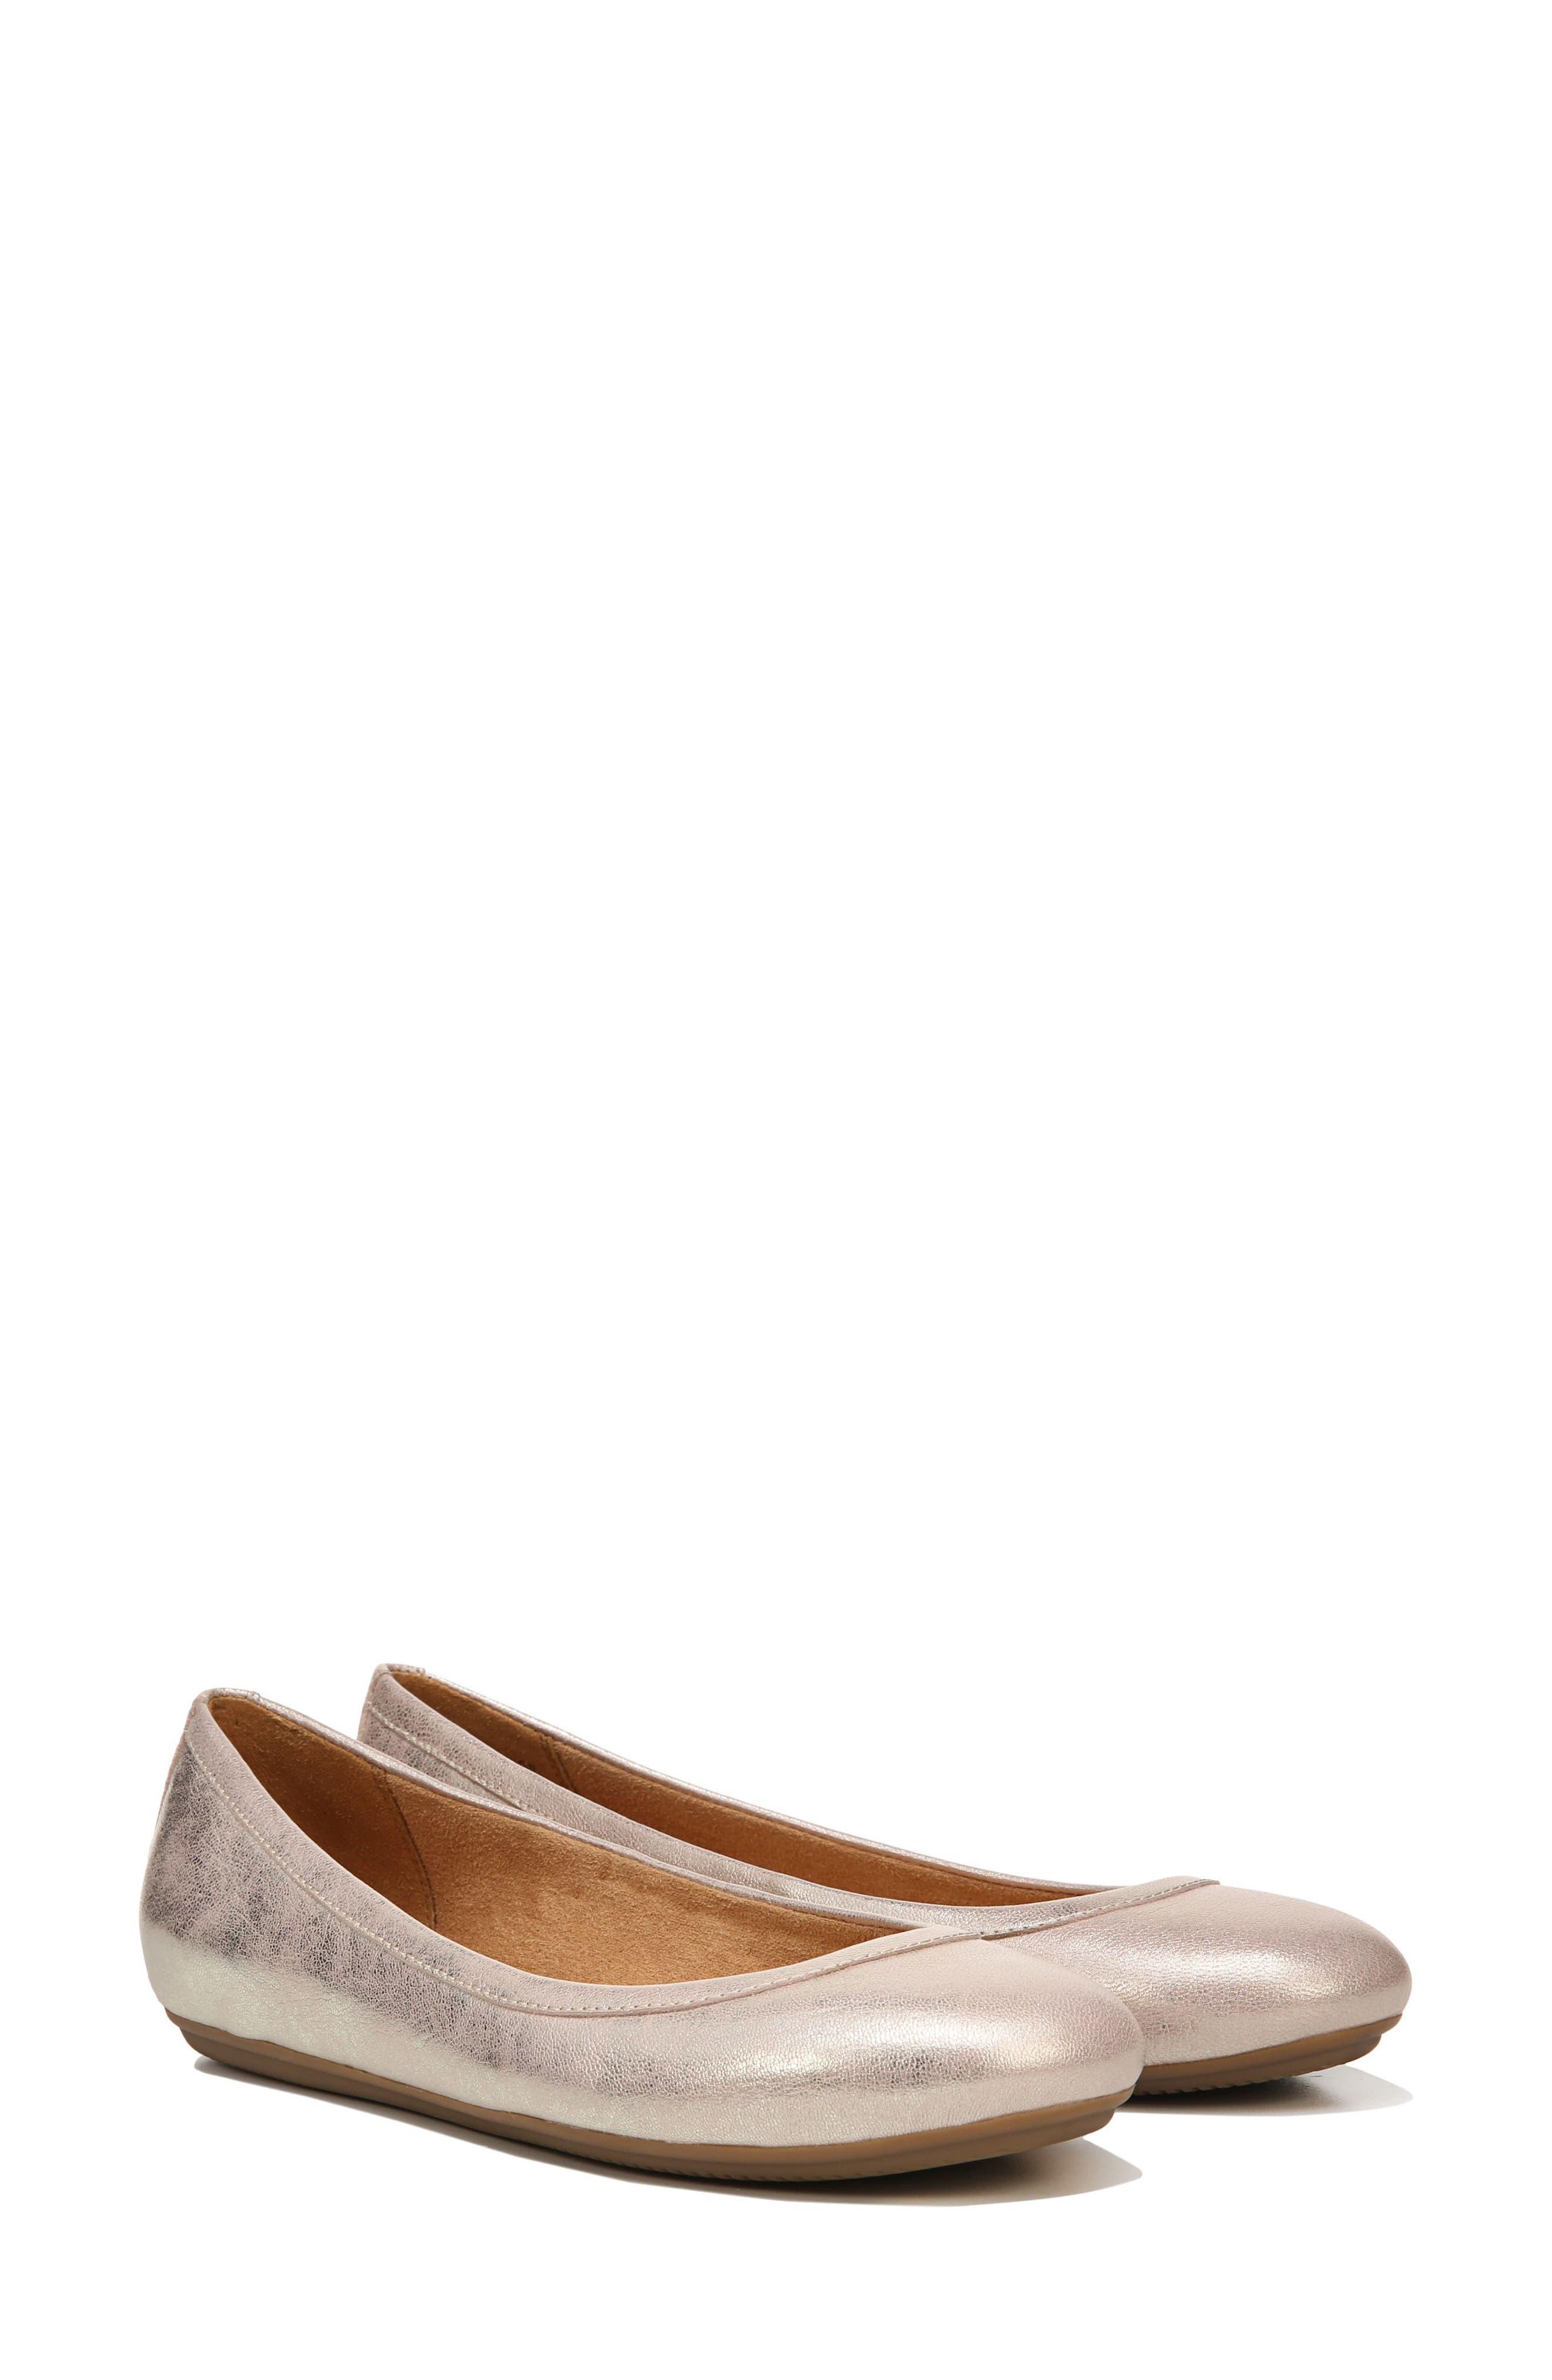 Brittany Ballet Flat,                             Alternate thumbnail 72, color,